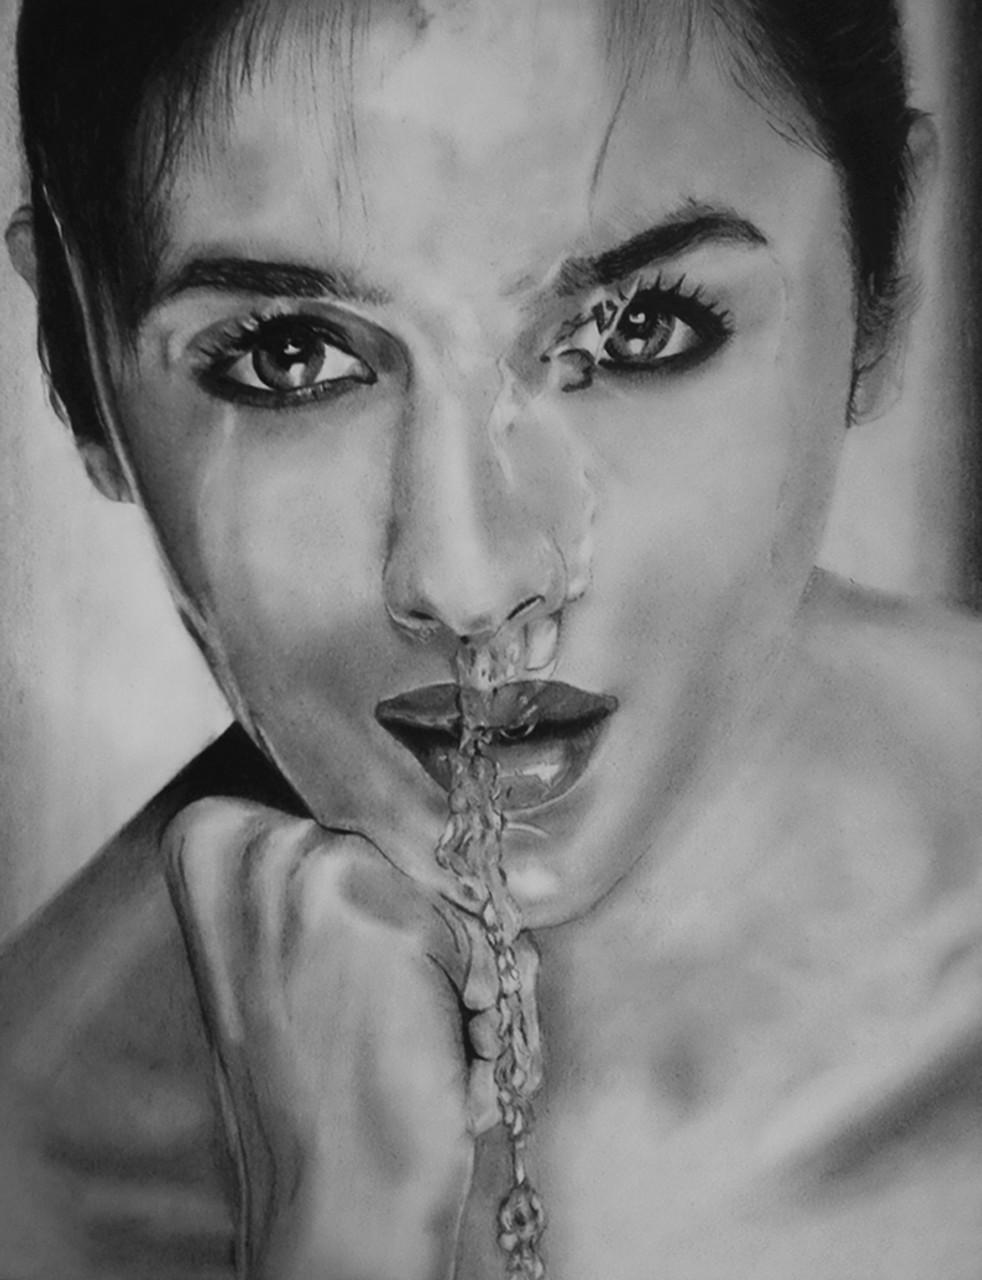 Alia bhatt graphite pencil drawing art 5097 29866 handpainted art painting 10in x 11in